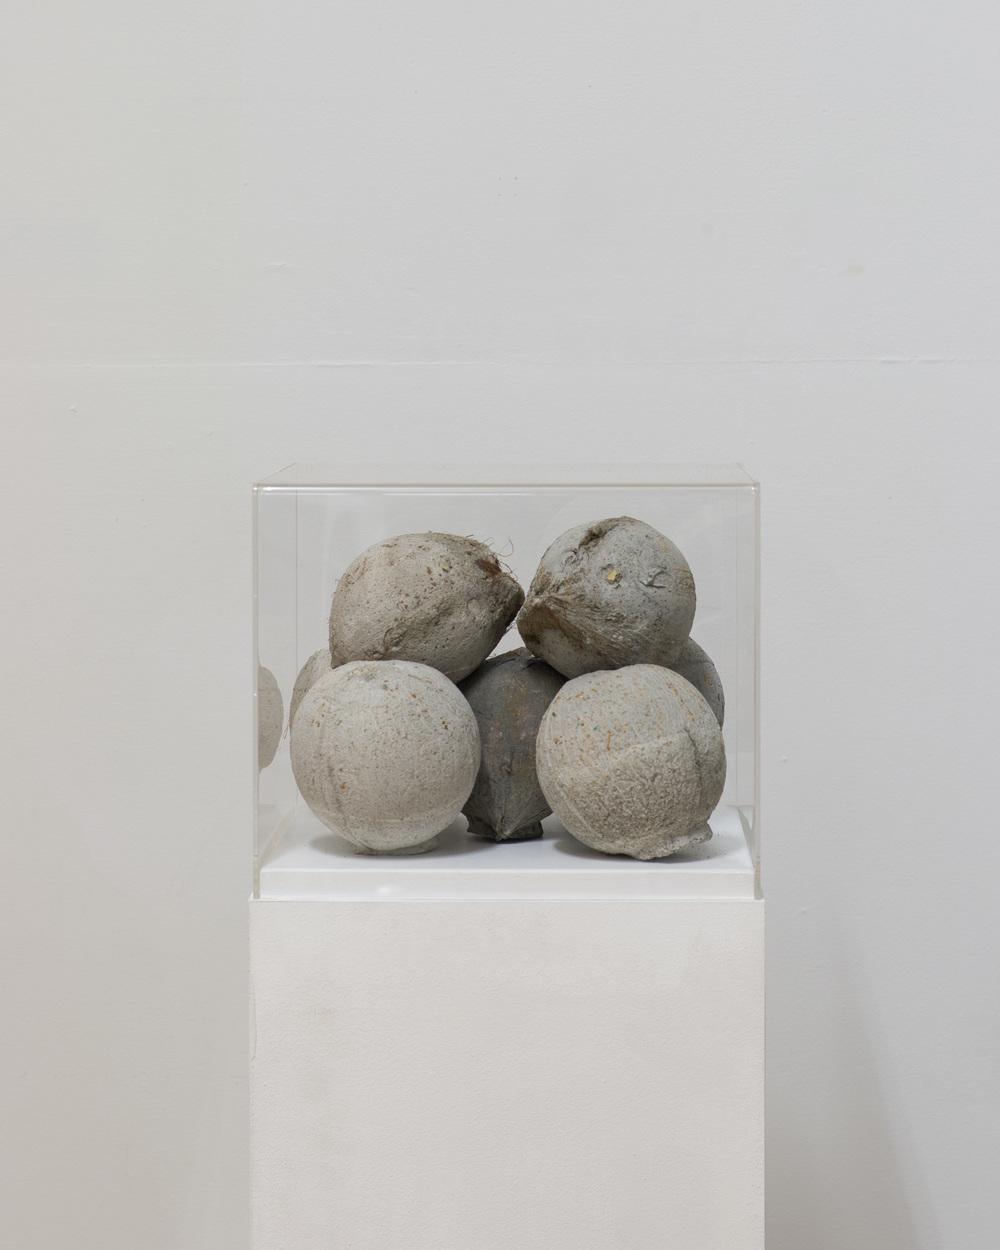 Pooja Niu    2015    Concrete, coconut husk    approx. 12 x 12 x 12cm     Enquire